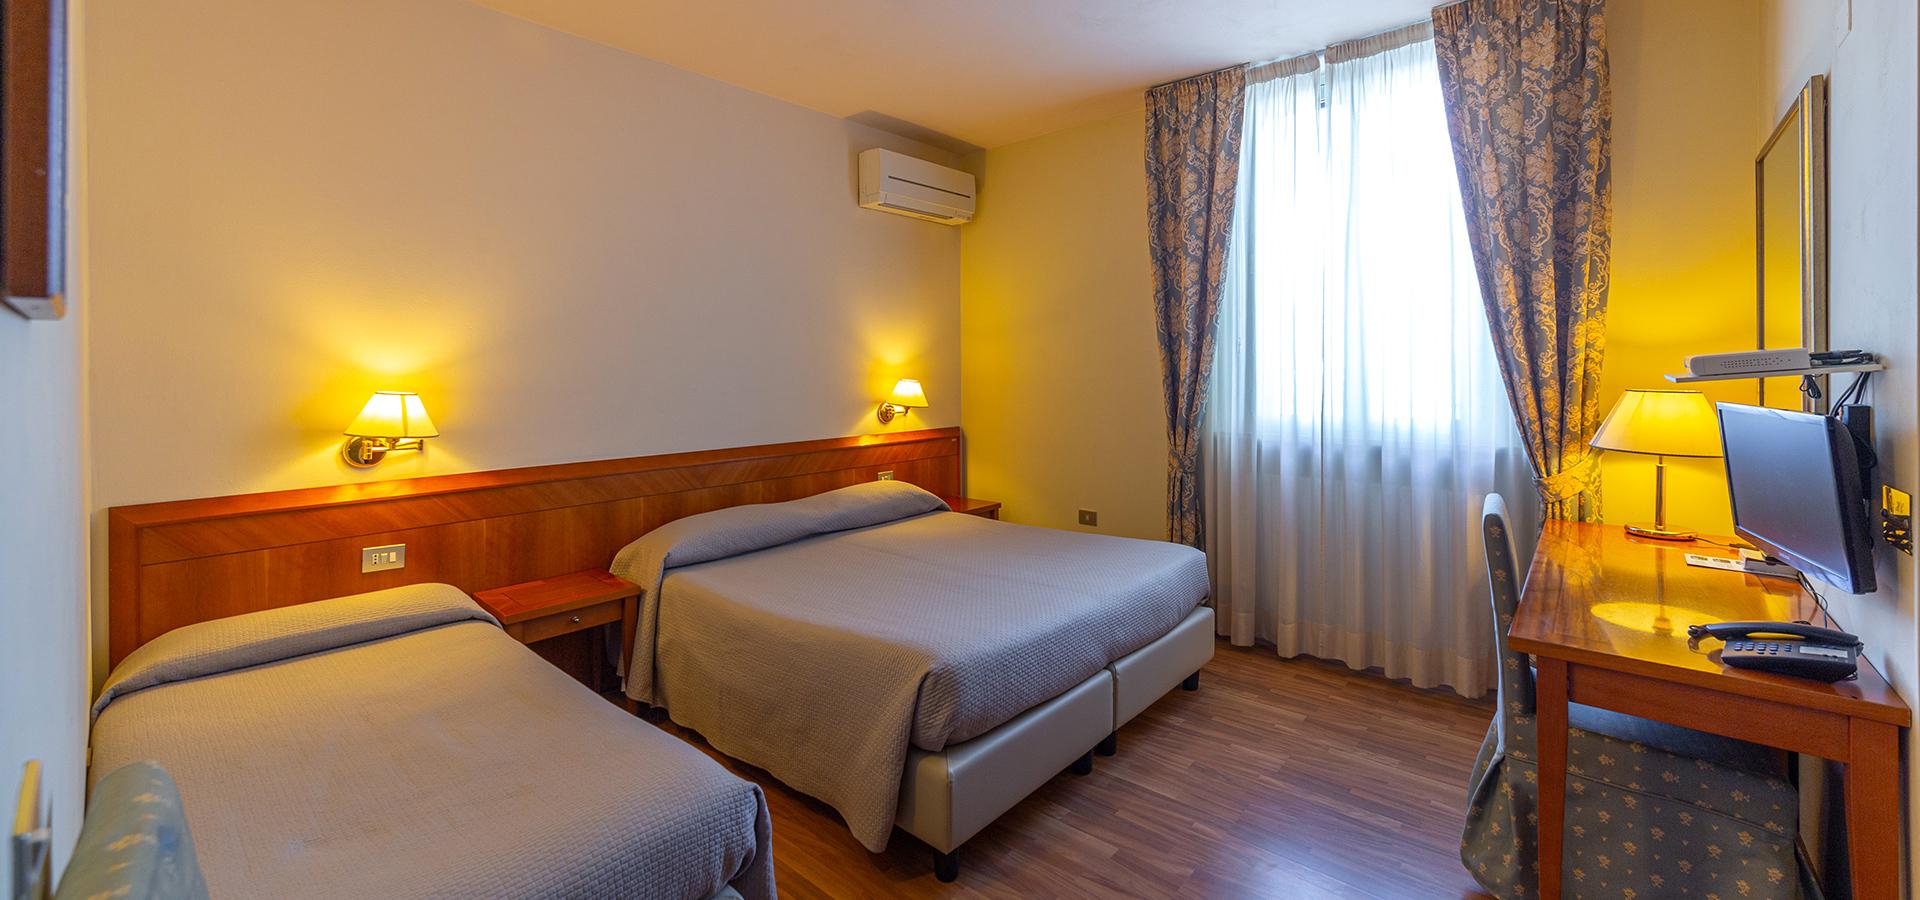 Hotel Cristallo slide 1